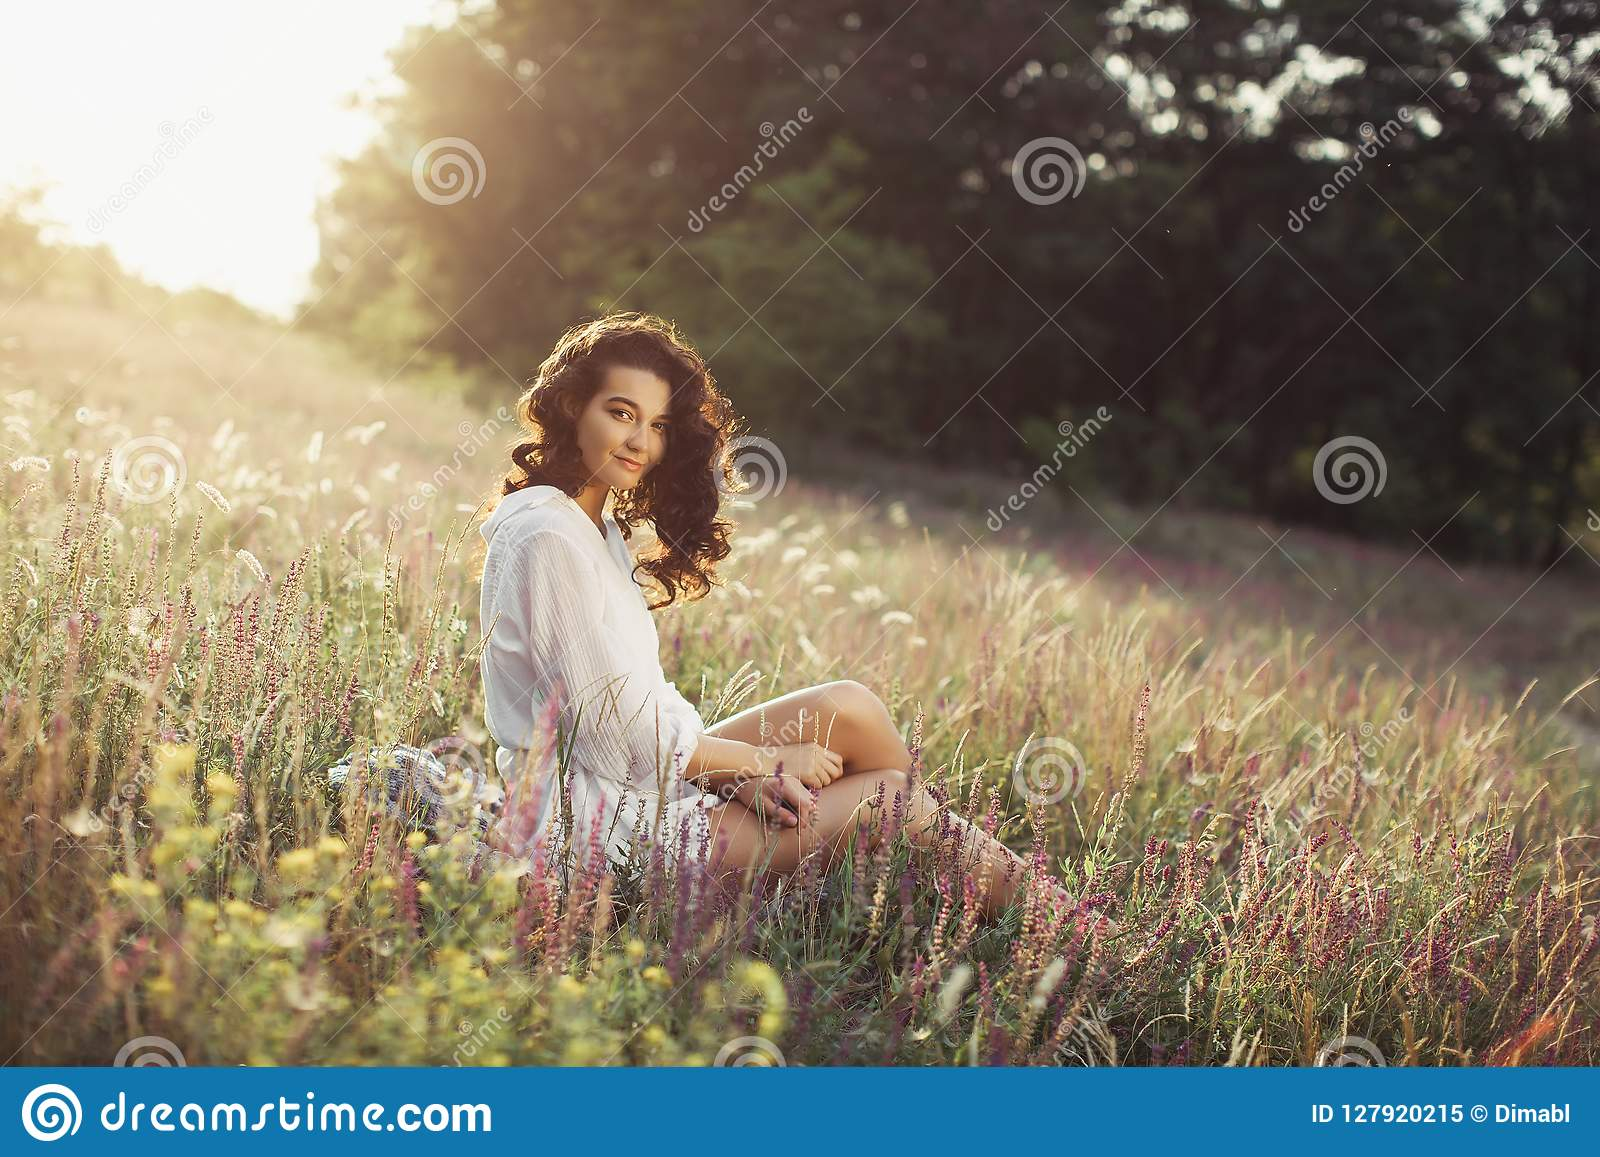 Free Happy Woman Enjoying Nature Beauty Girl Outdoor Freedom Concept Stock Image Image Of Girl Beautiful 127920215